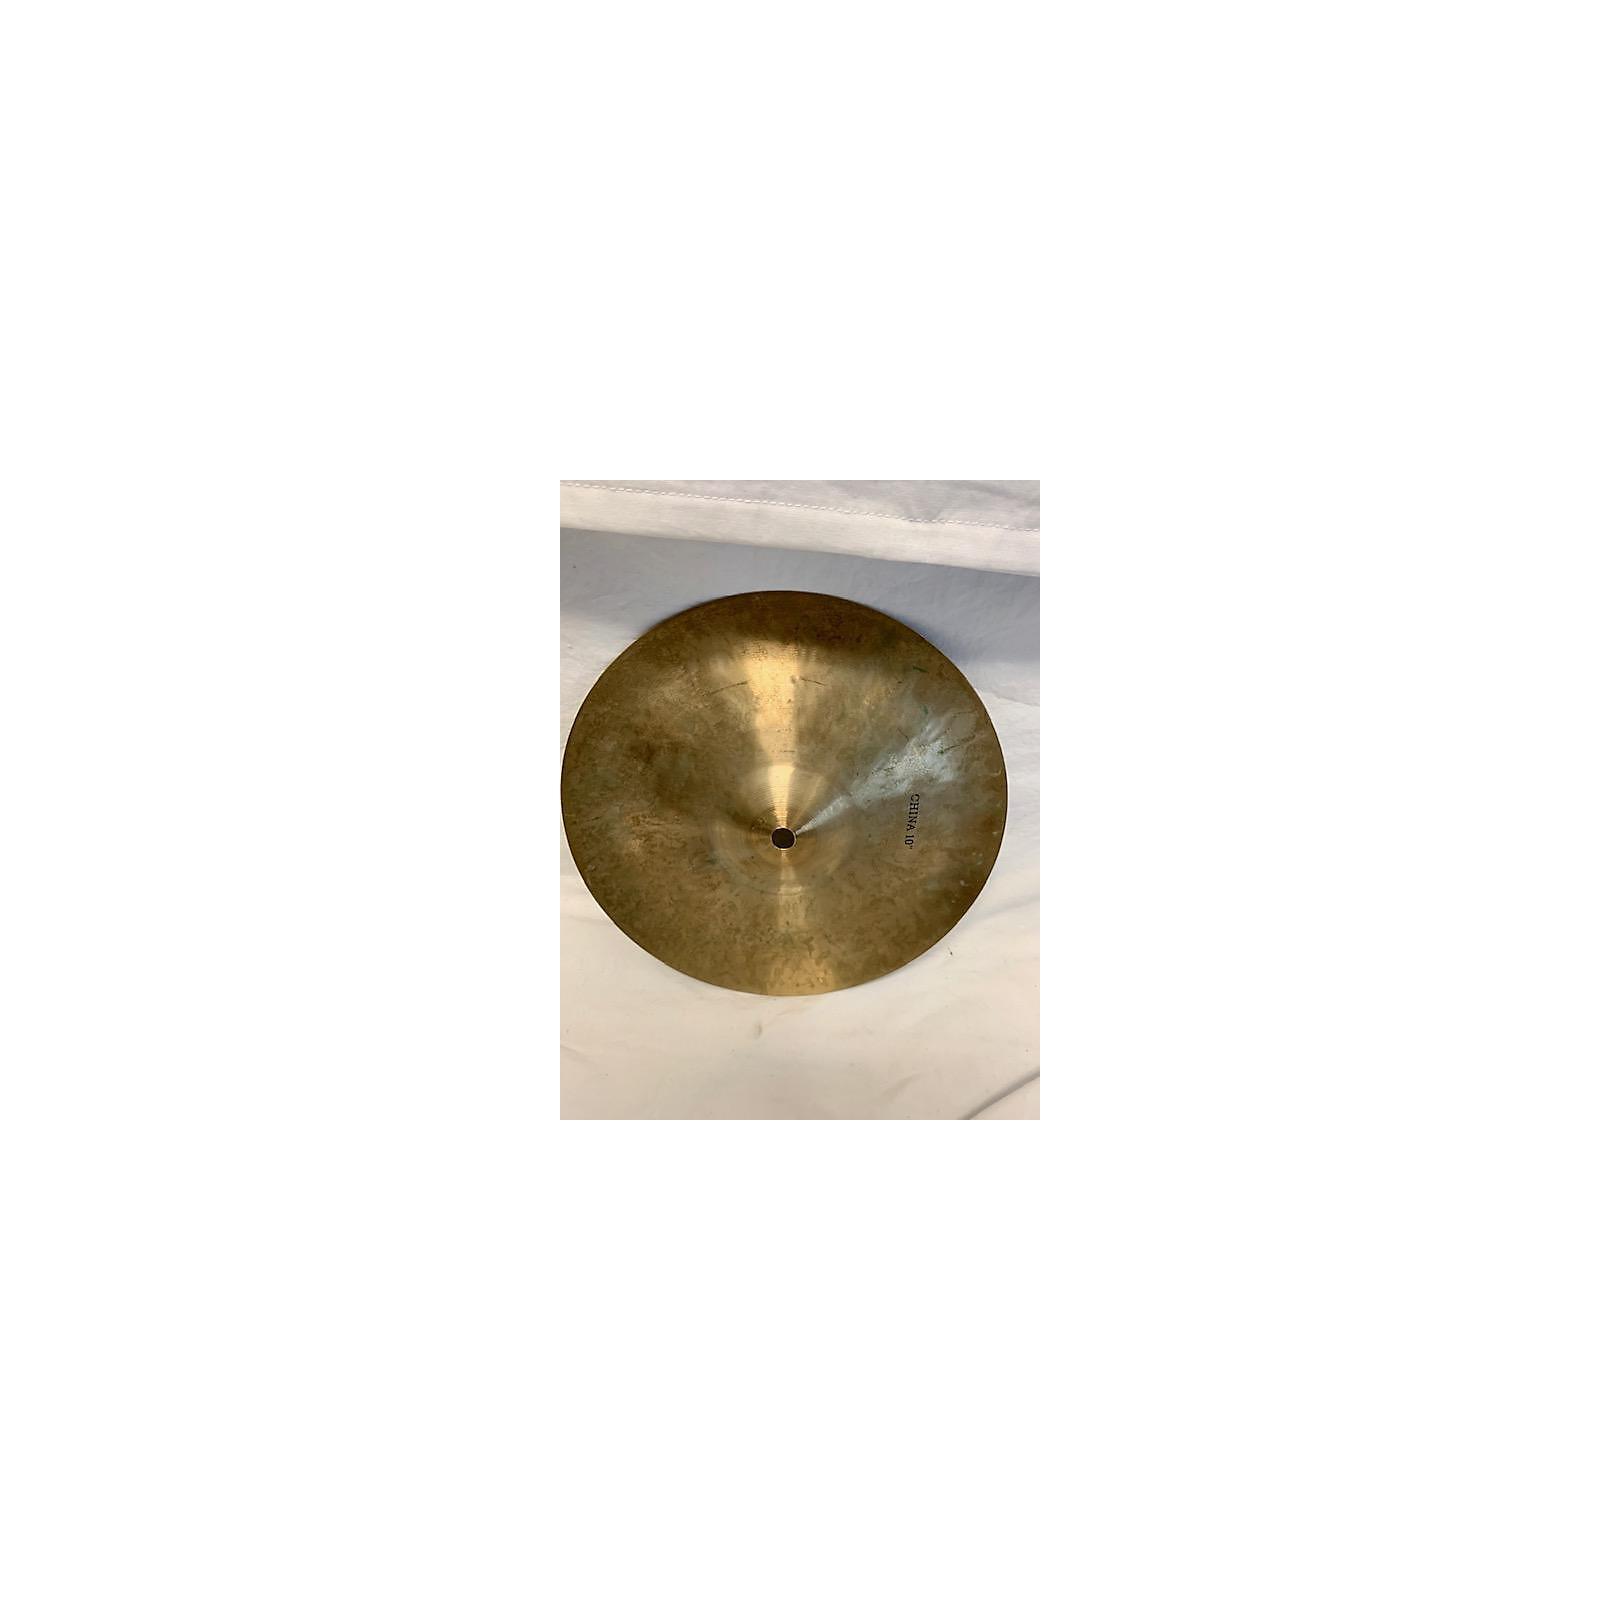 Soultone 10in Custom Series China Cymbal